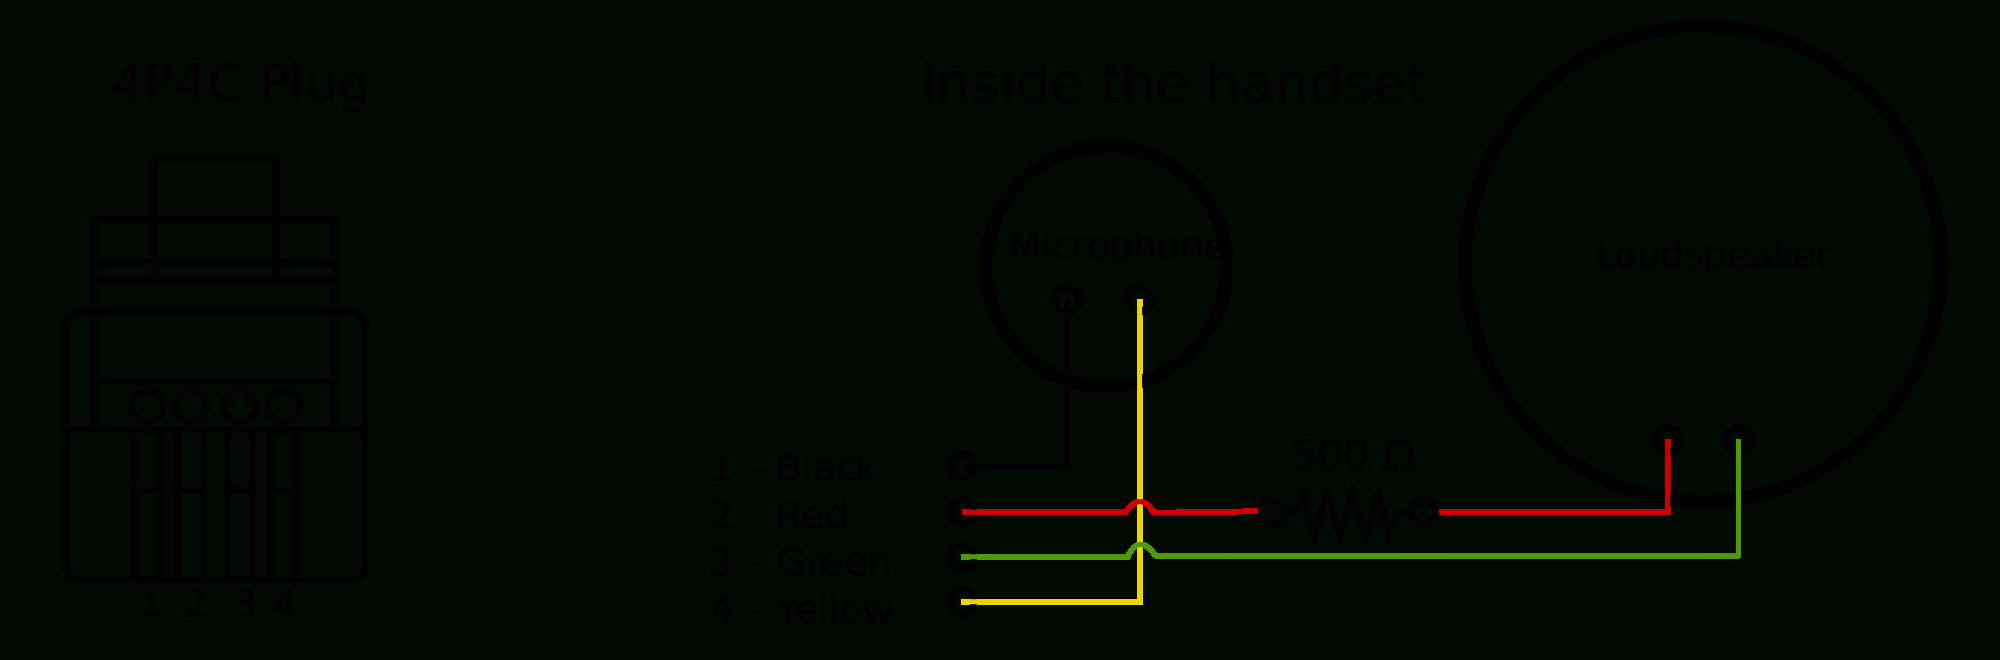 File:rj9 Handset Diagram.svg - Wikimedia Commons - Phone Wiring Diagram